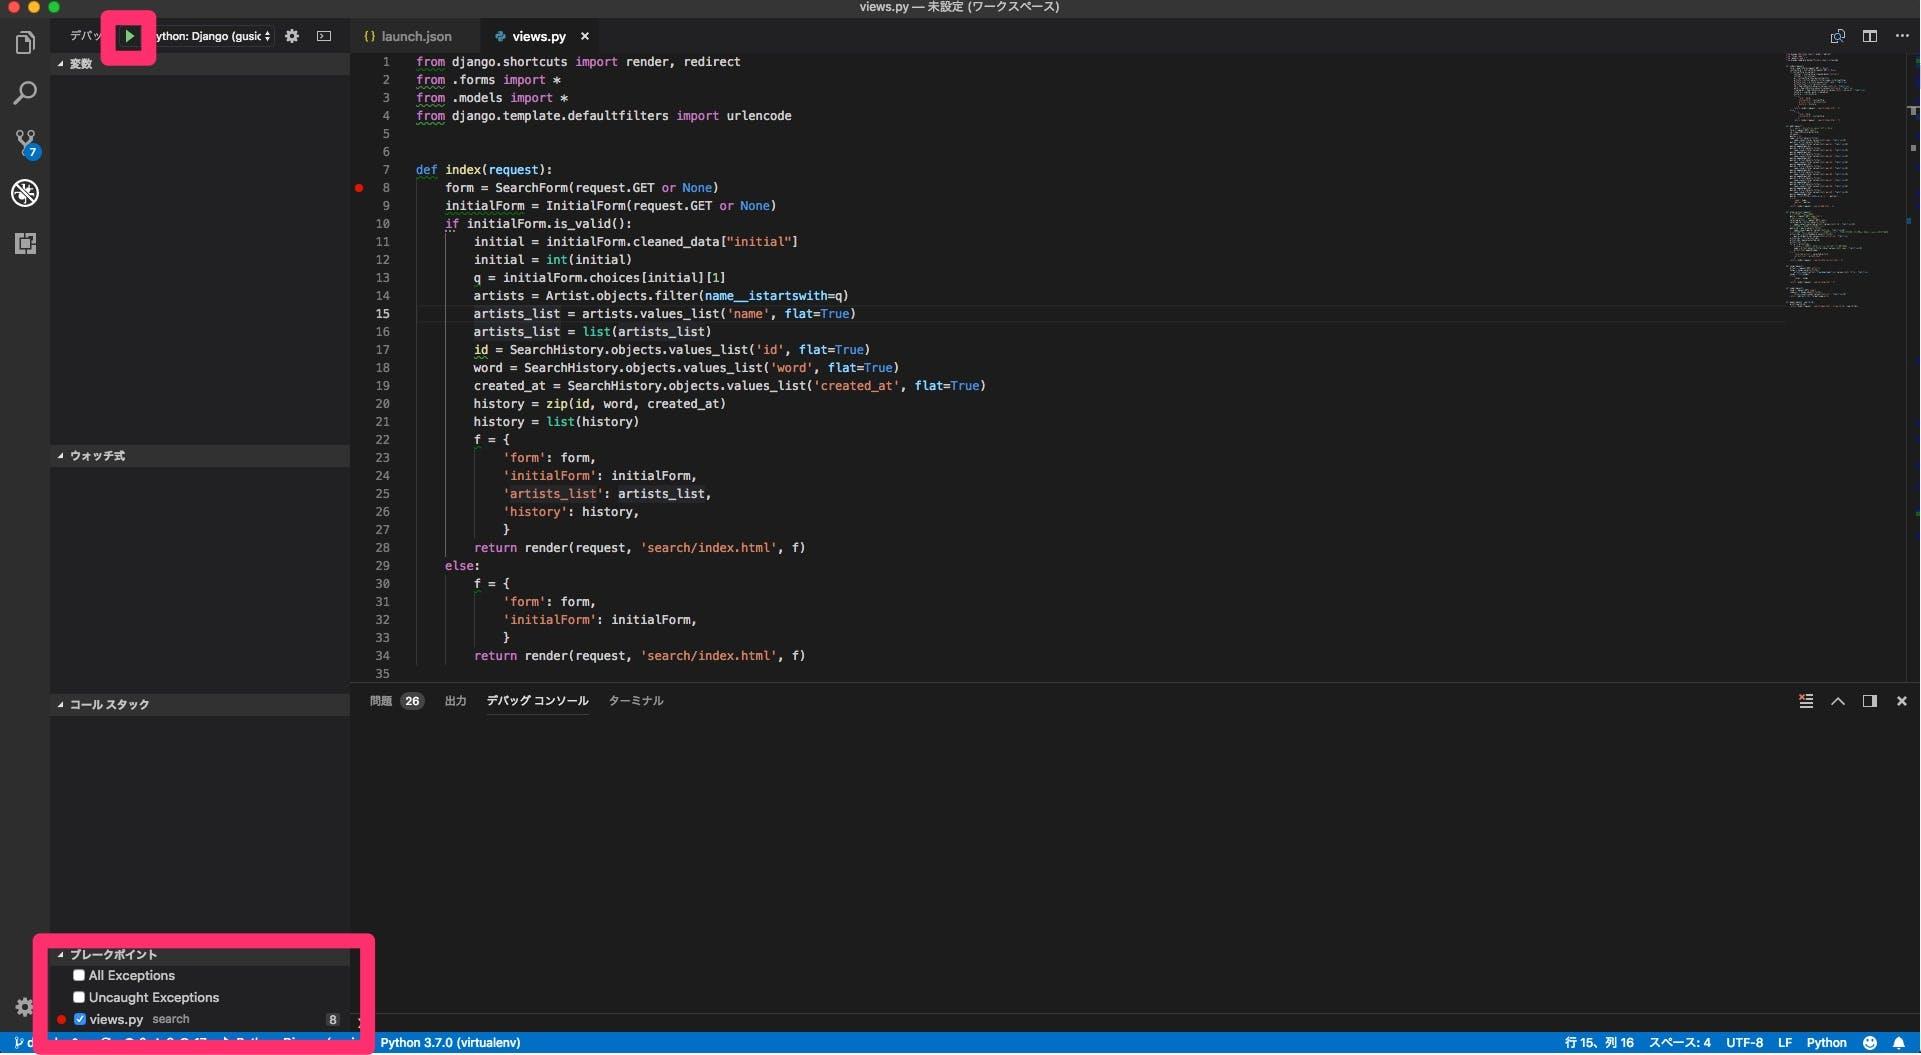 views_py_—_未設定__ワークスペース__と_「macでPythonの環境構築_仮想環境作成_DjangoをVSCodeでデバッグ」を編集_-_Qiita.jpg